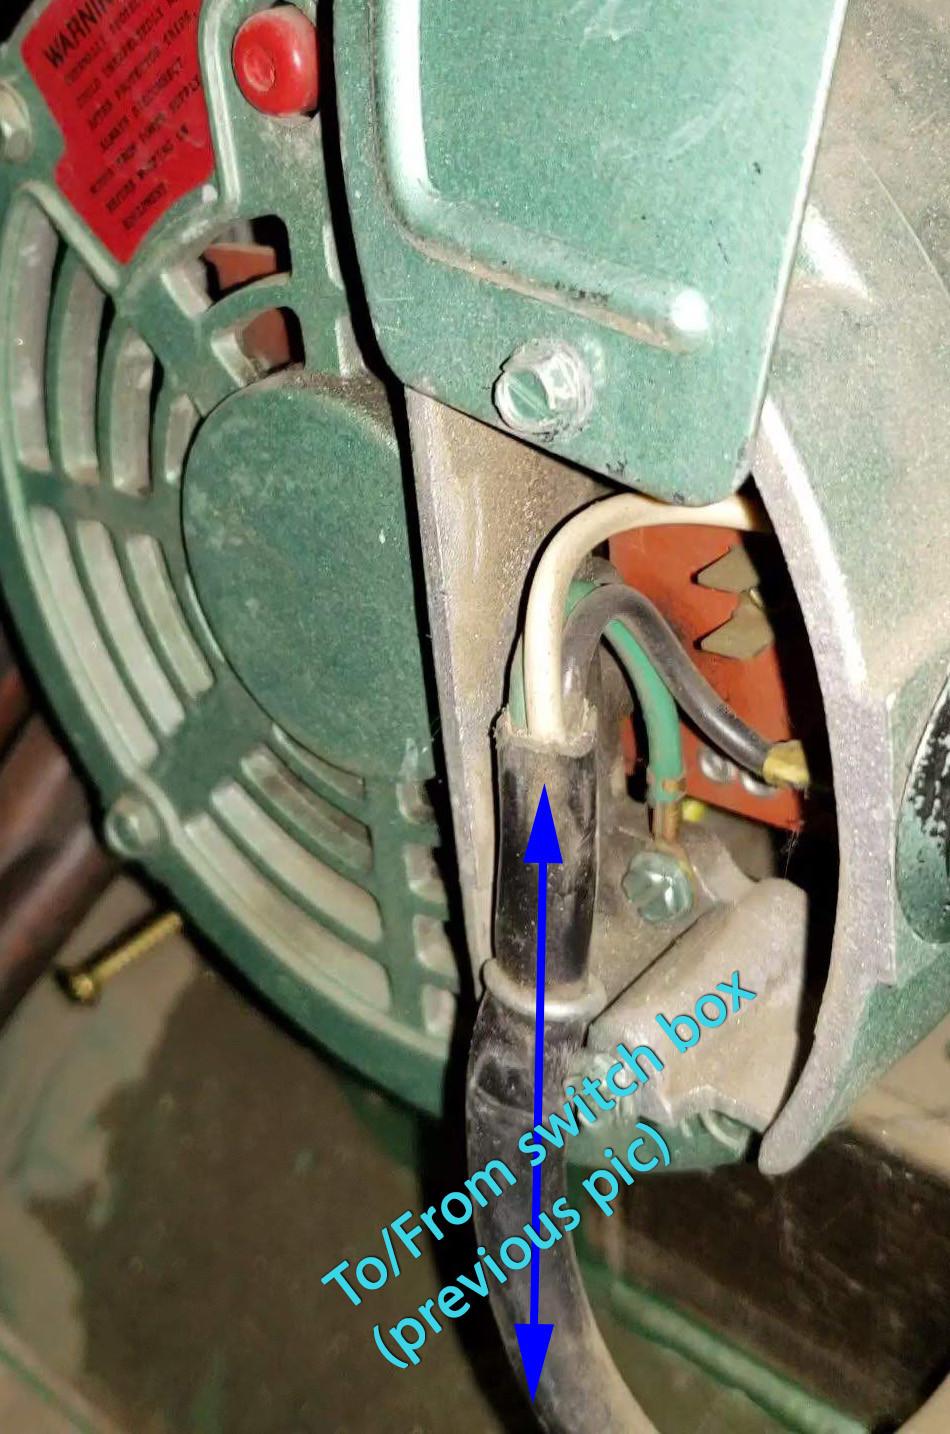 Ac Compressor Wiring Doerr Lr22132 Wiring Diagram Doityourself Com Community